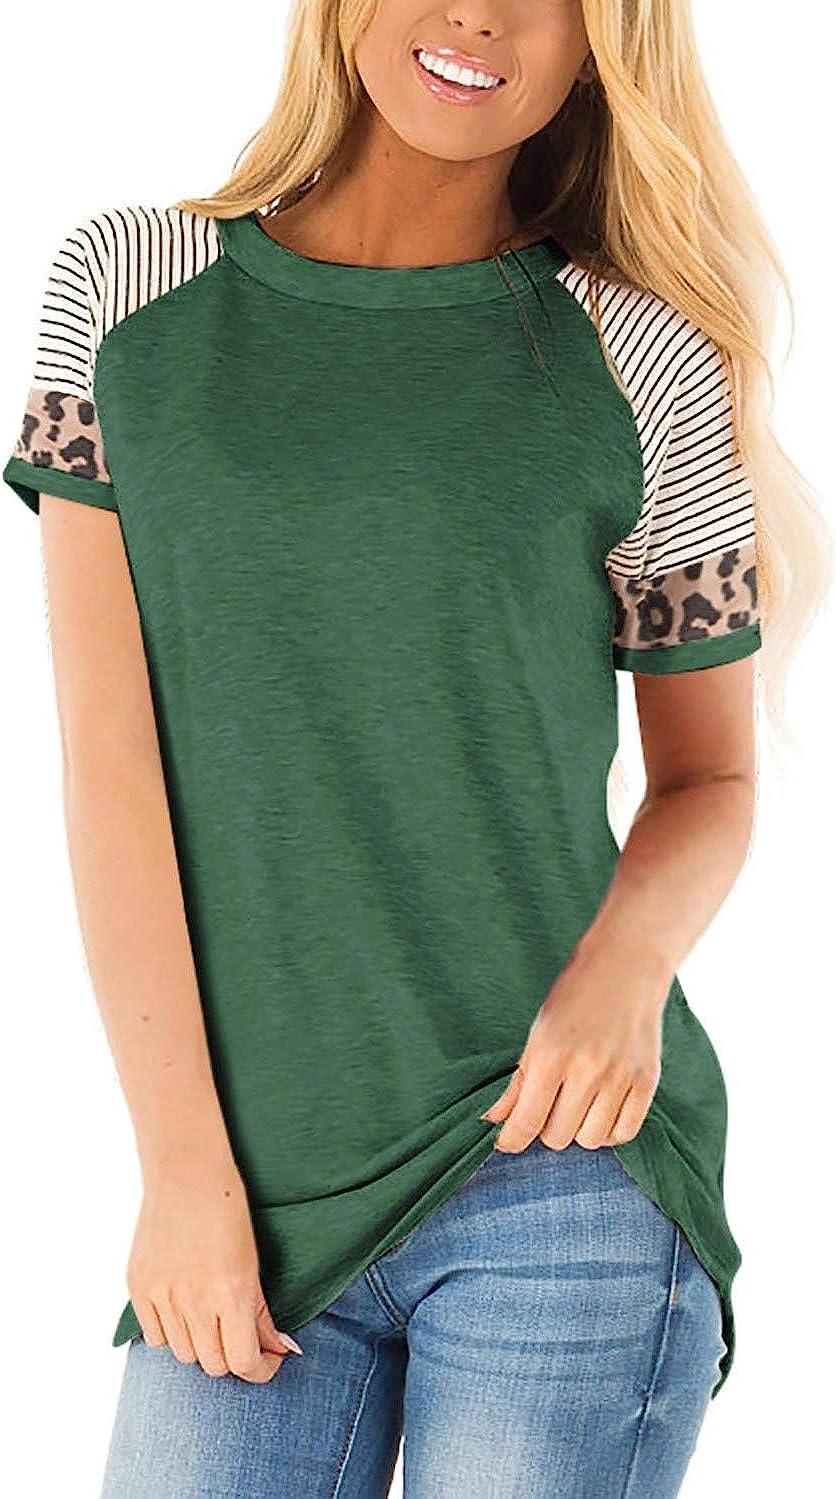 QACOHU Womens Striped Color Block Tunic Tops Leopard Short Sleeve Blouses Shirt